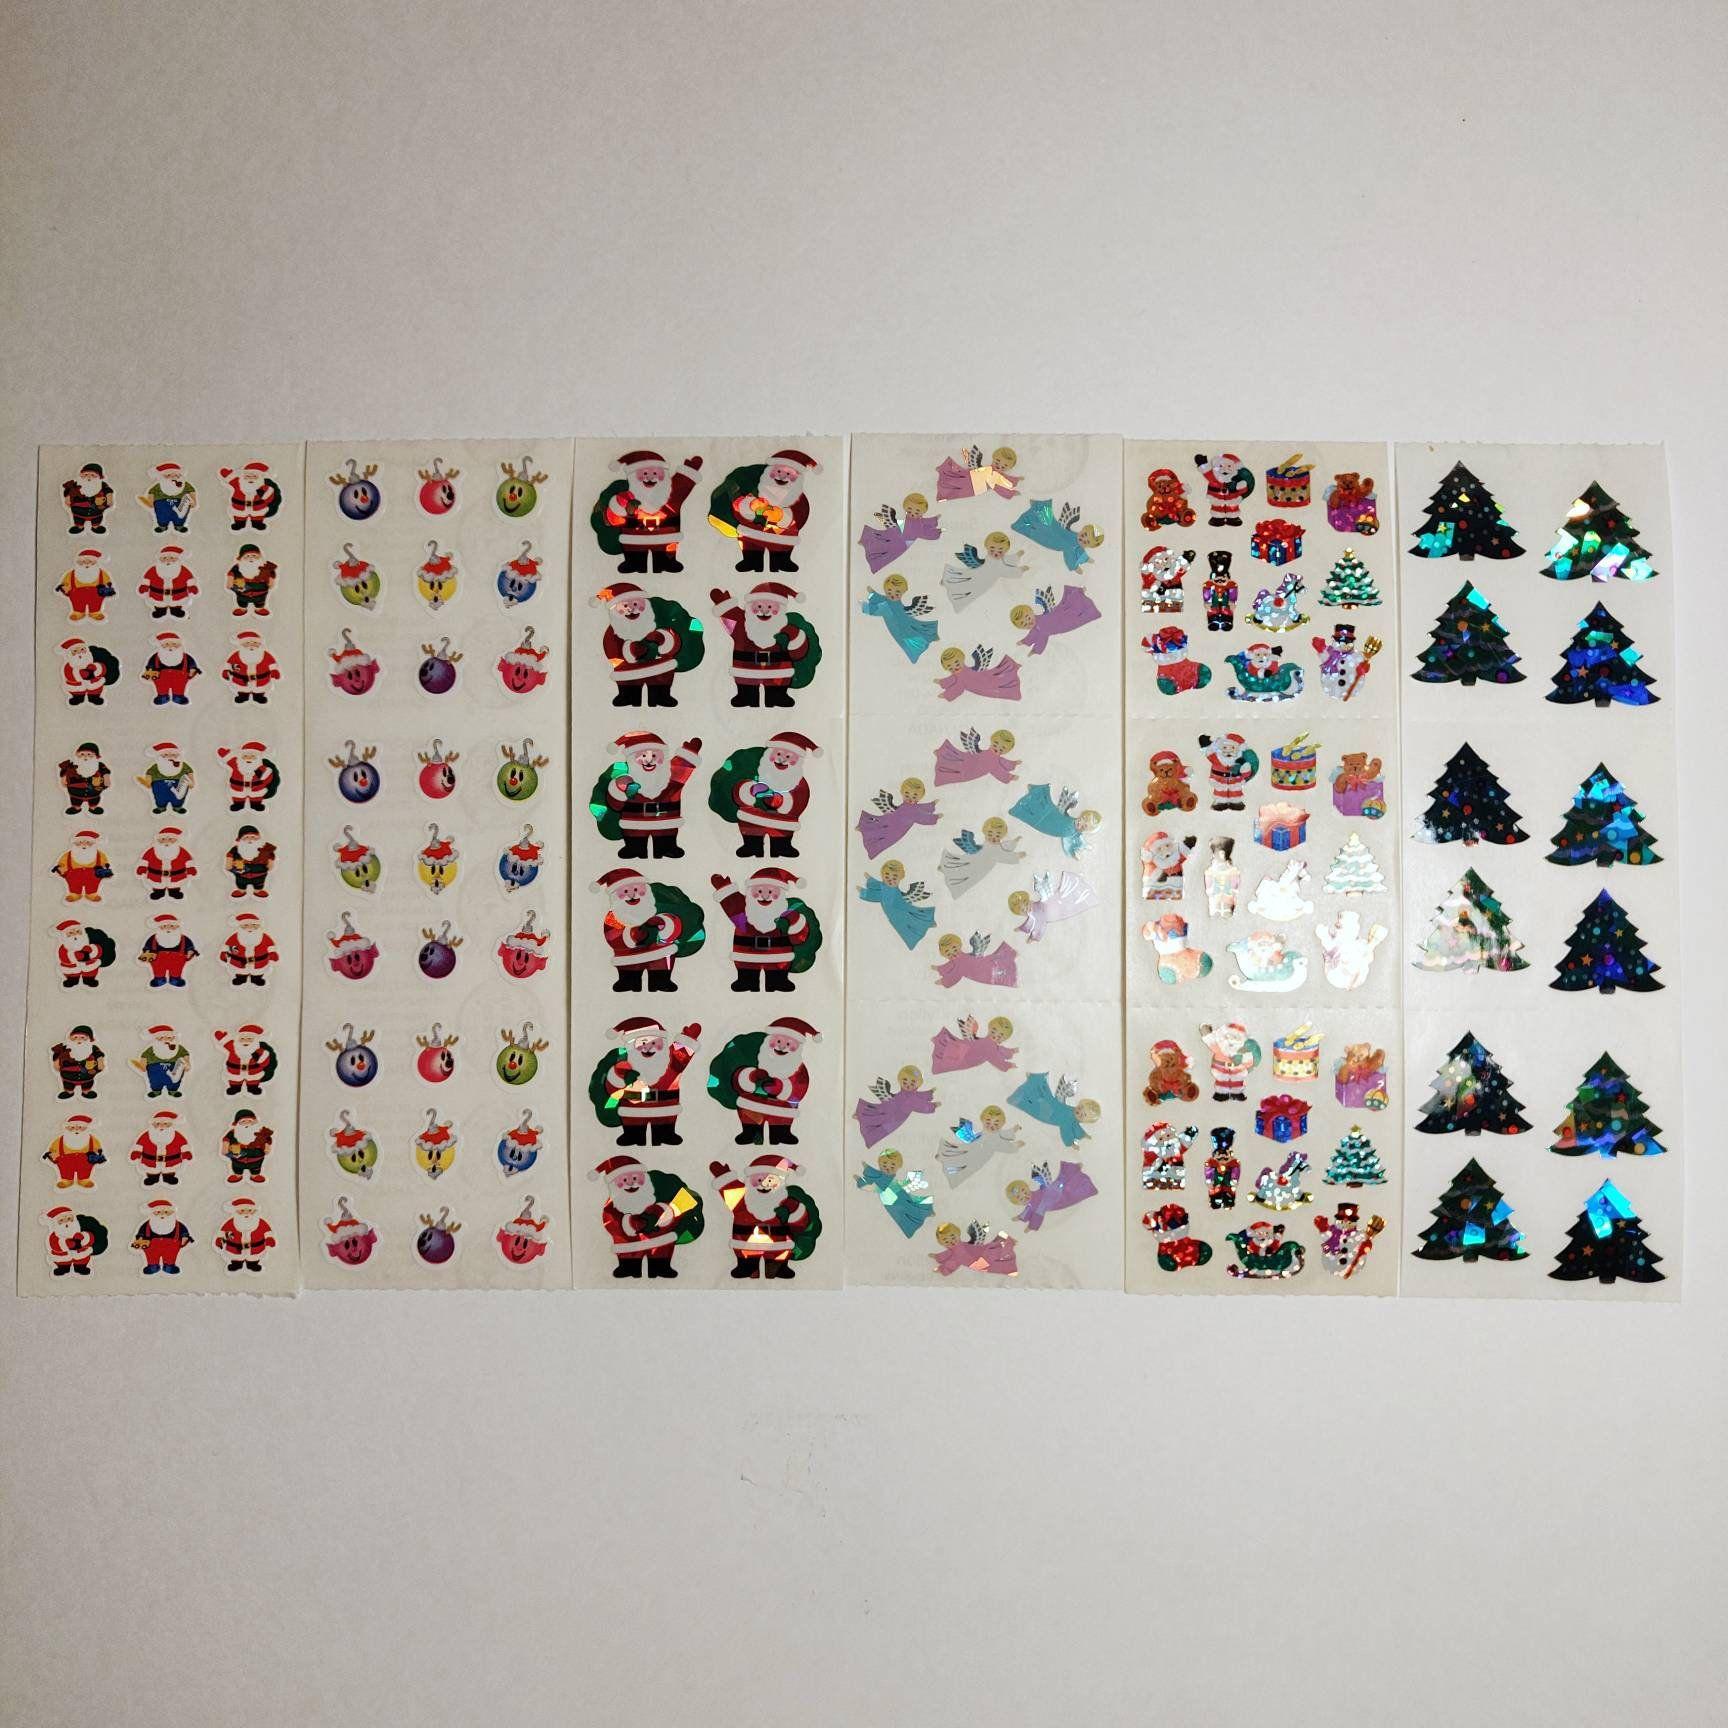 Sandylion Christmas Lot 6 Sheets Vintage Sandylion Stickers Etsy In 2020 Planner Supplies Sticker Sheets Princess Sticker